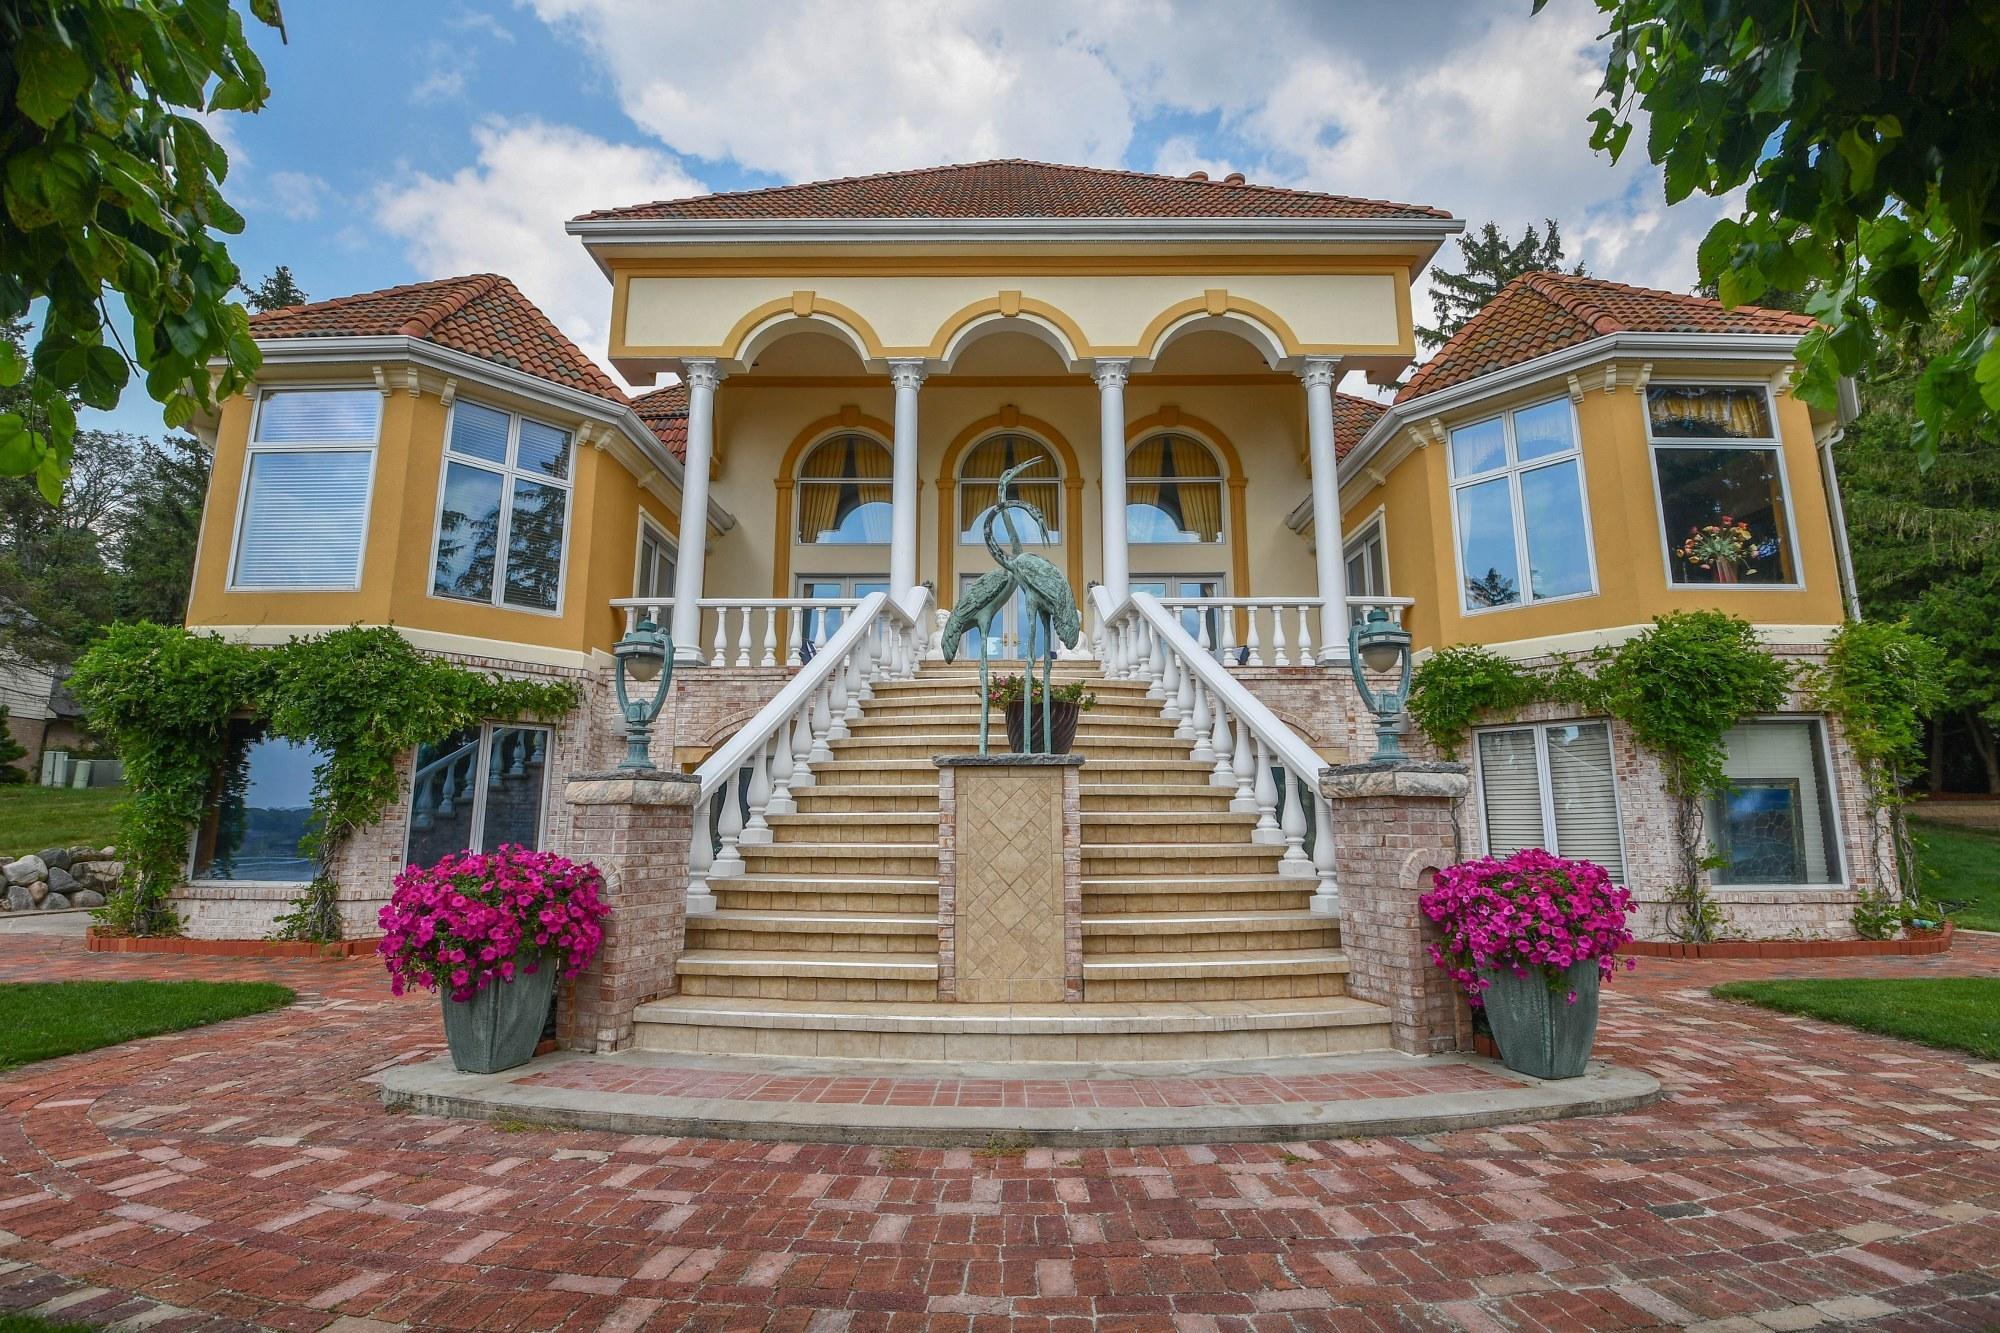 34625 Springbank Rd, Oconomowoc Lake, Wisconsin 53066, 6 Bedrooms Bedrooms, 14 Rooms Rooms,5 BathroomsBathrooms,Single-Family,For Sale,Springbank Rd,1756812